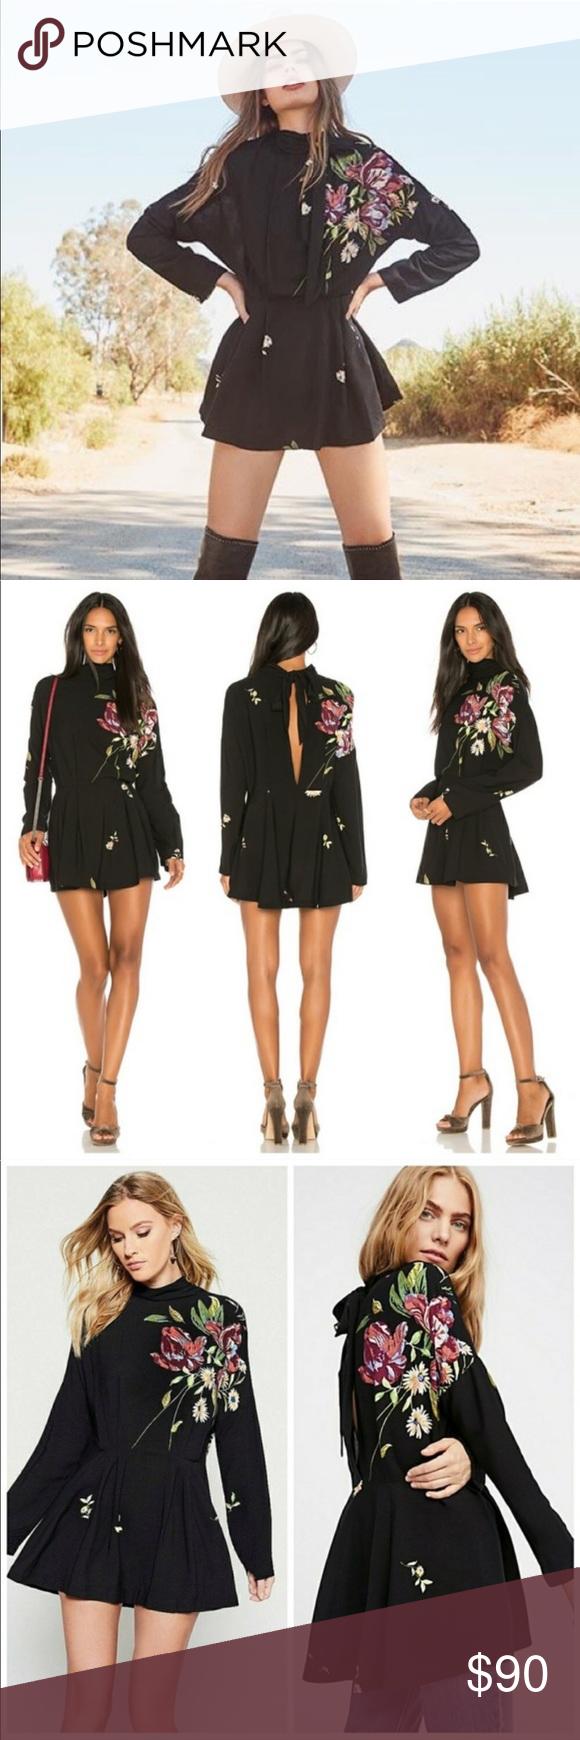 5226d8c2df9 Free People Gemma Mini Dress/ Tunic Free People Gemma Mini Dress/ Tunic  Brand new with tags 100% Rayon 🚫 Trades 🚫 Modeling Free People Dresses  Mini